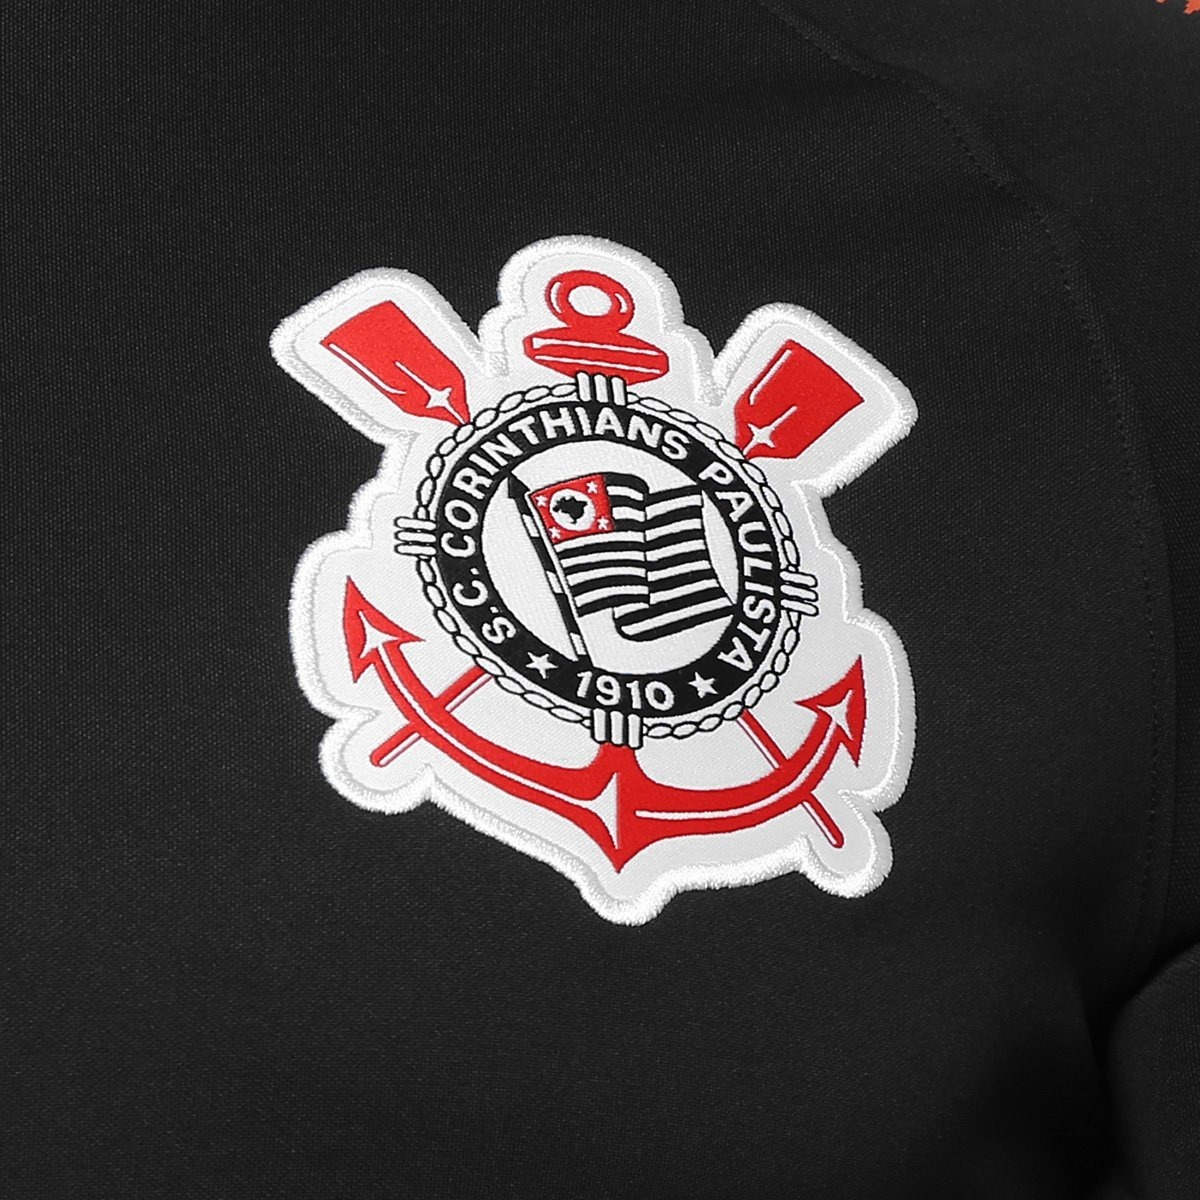 f90a8d3daea8d camisa nike corinthians 18 19 treino ctsports. Carregando zoom.